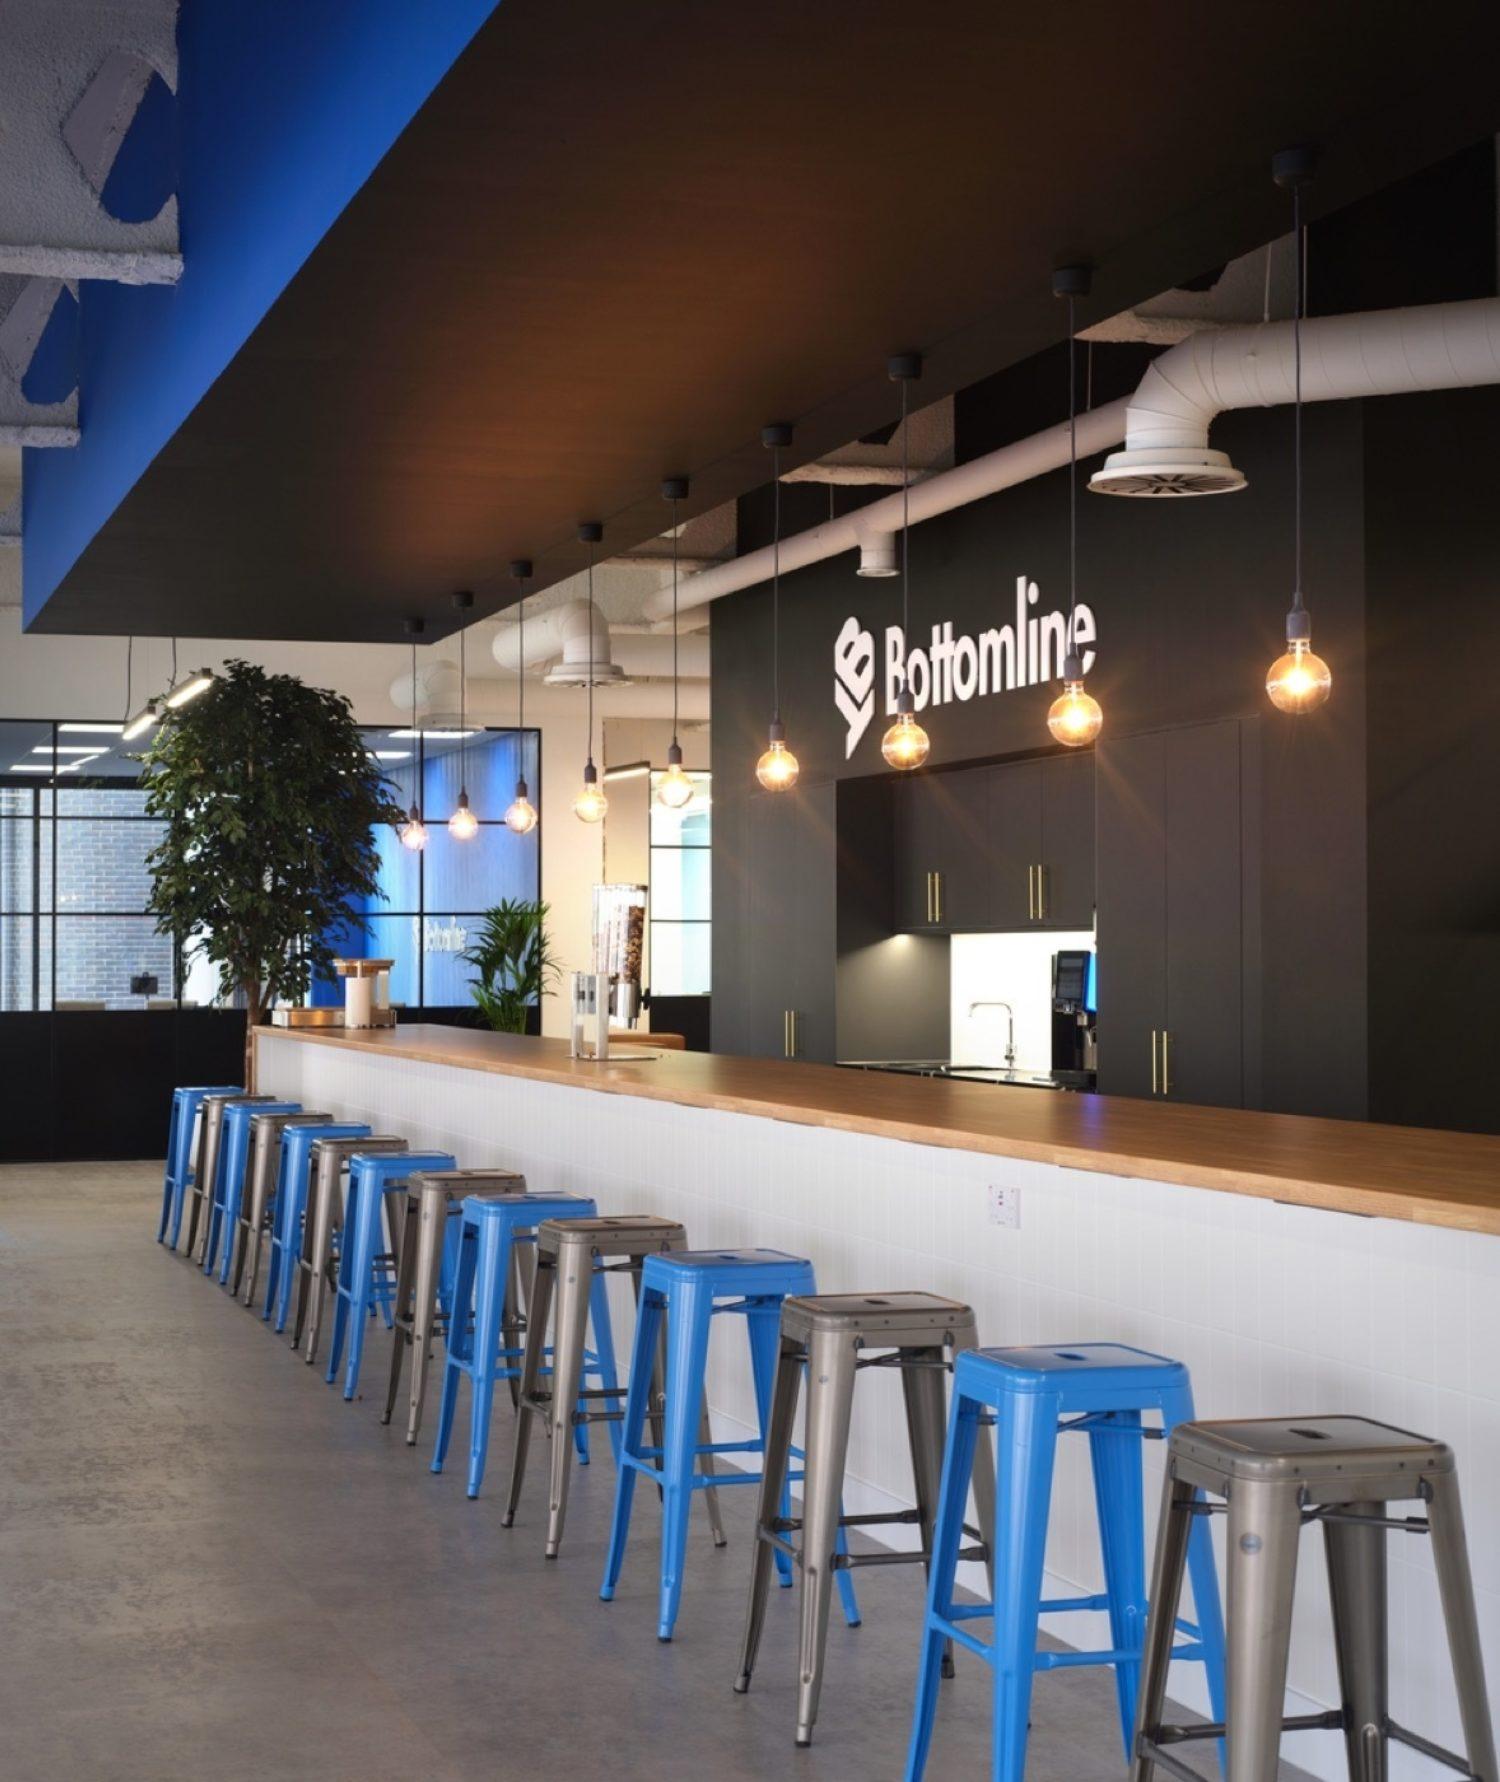 Bottomline breakfast bar in modern office design